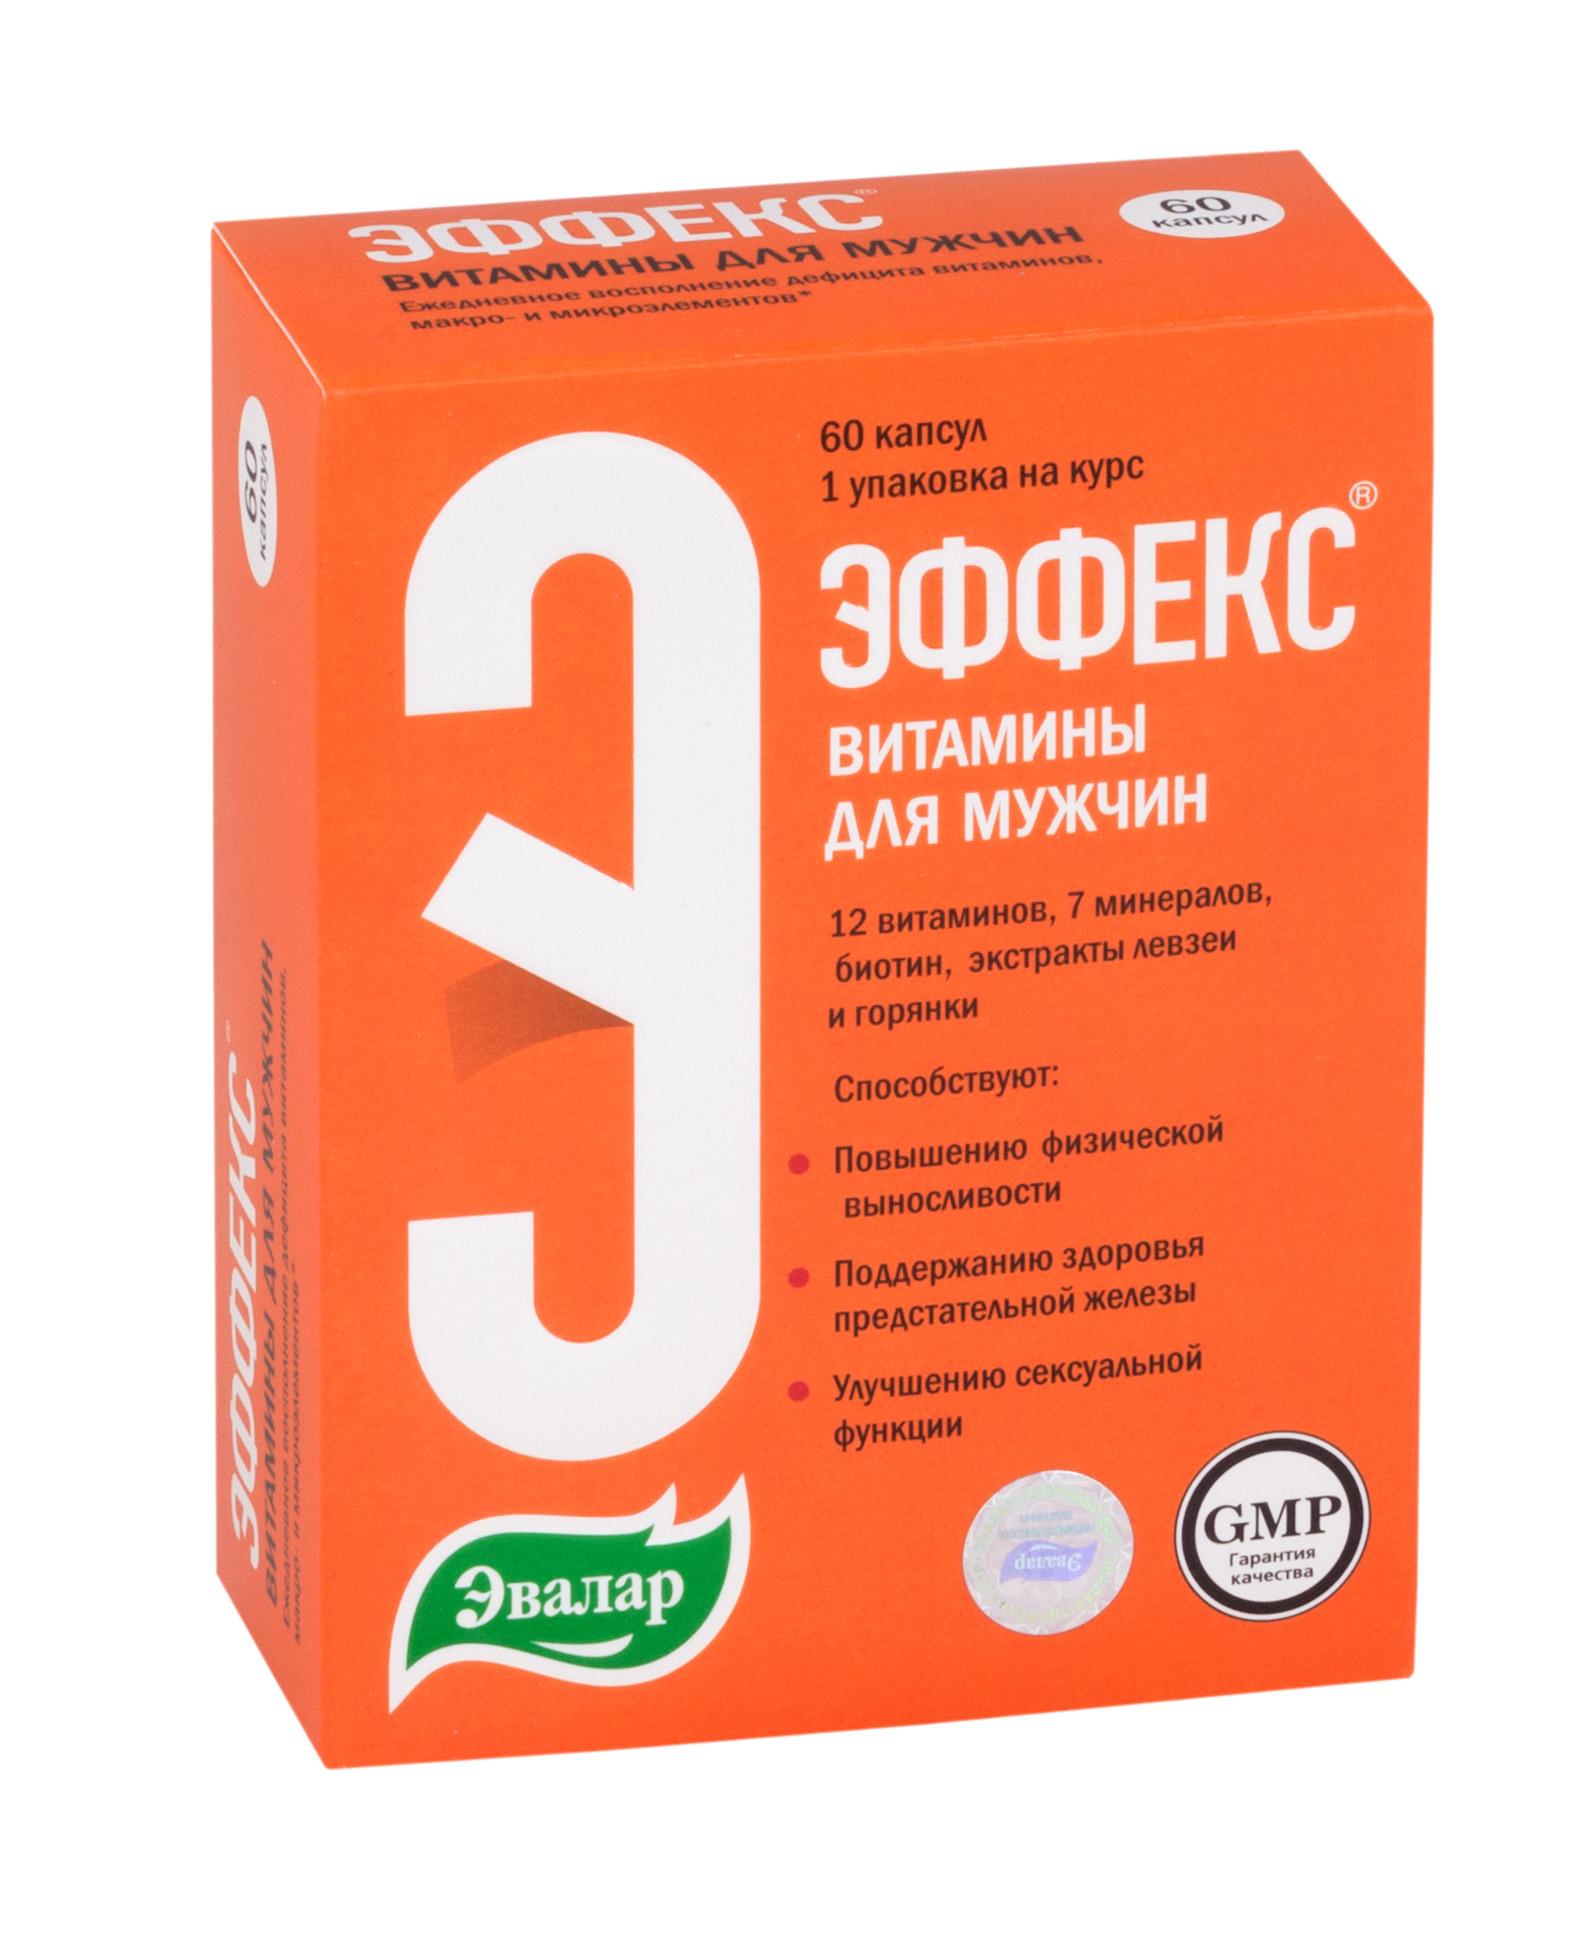 Эффекс витамины д/мужчин капс. n60